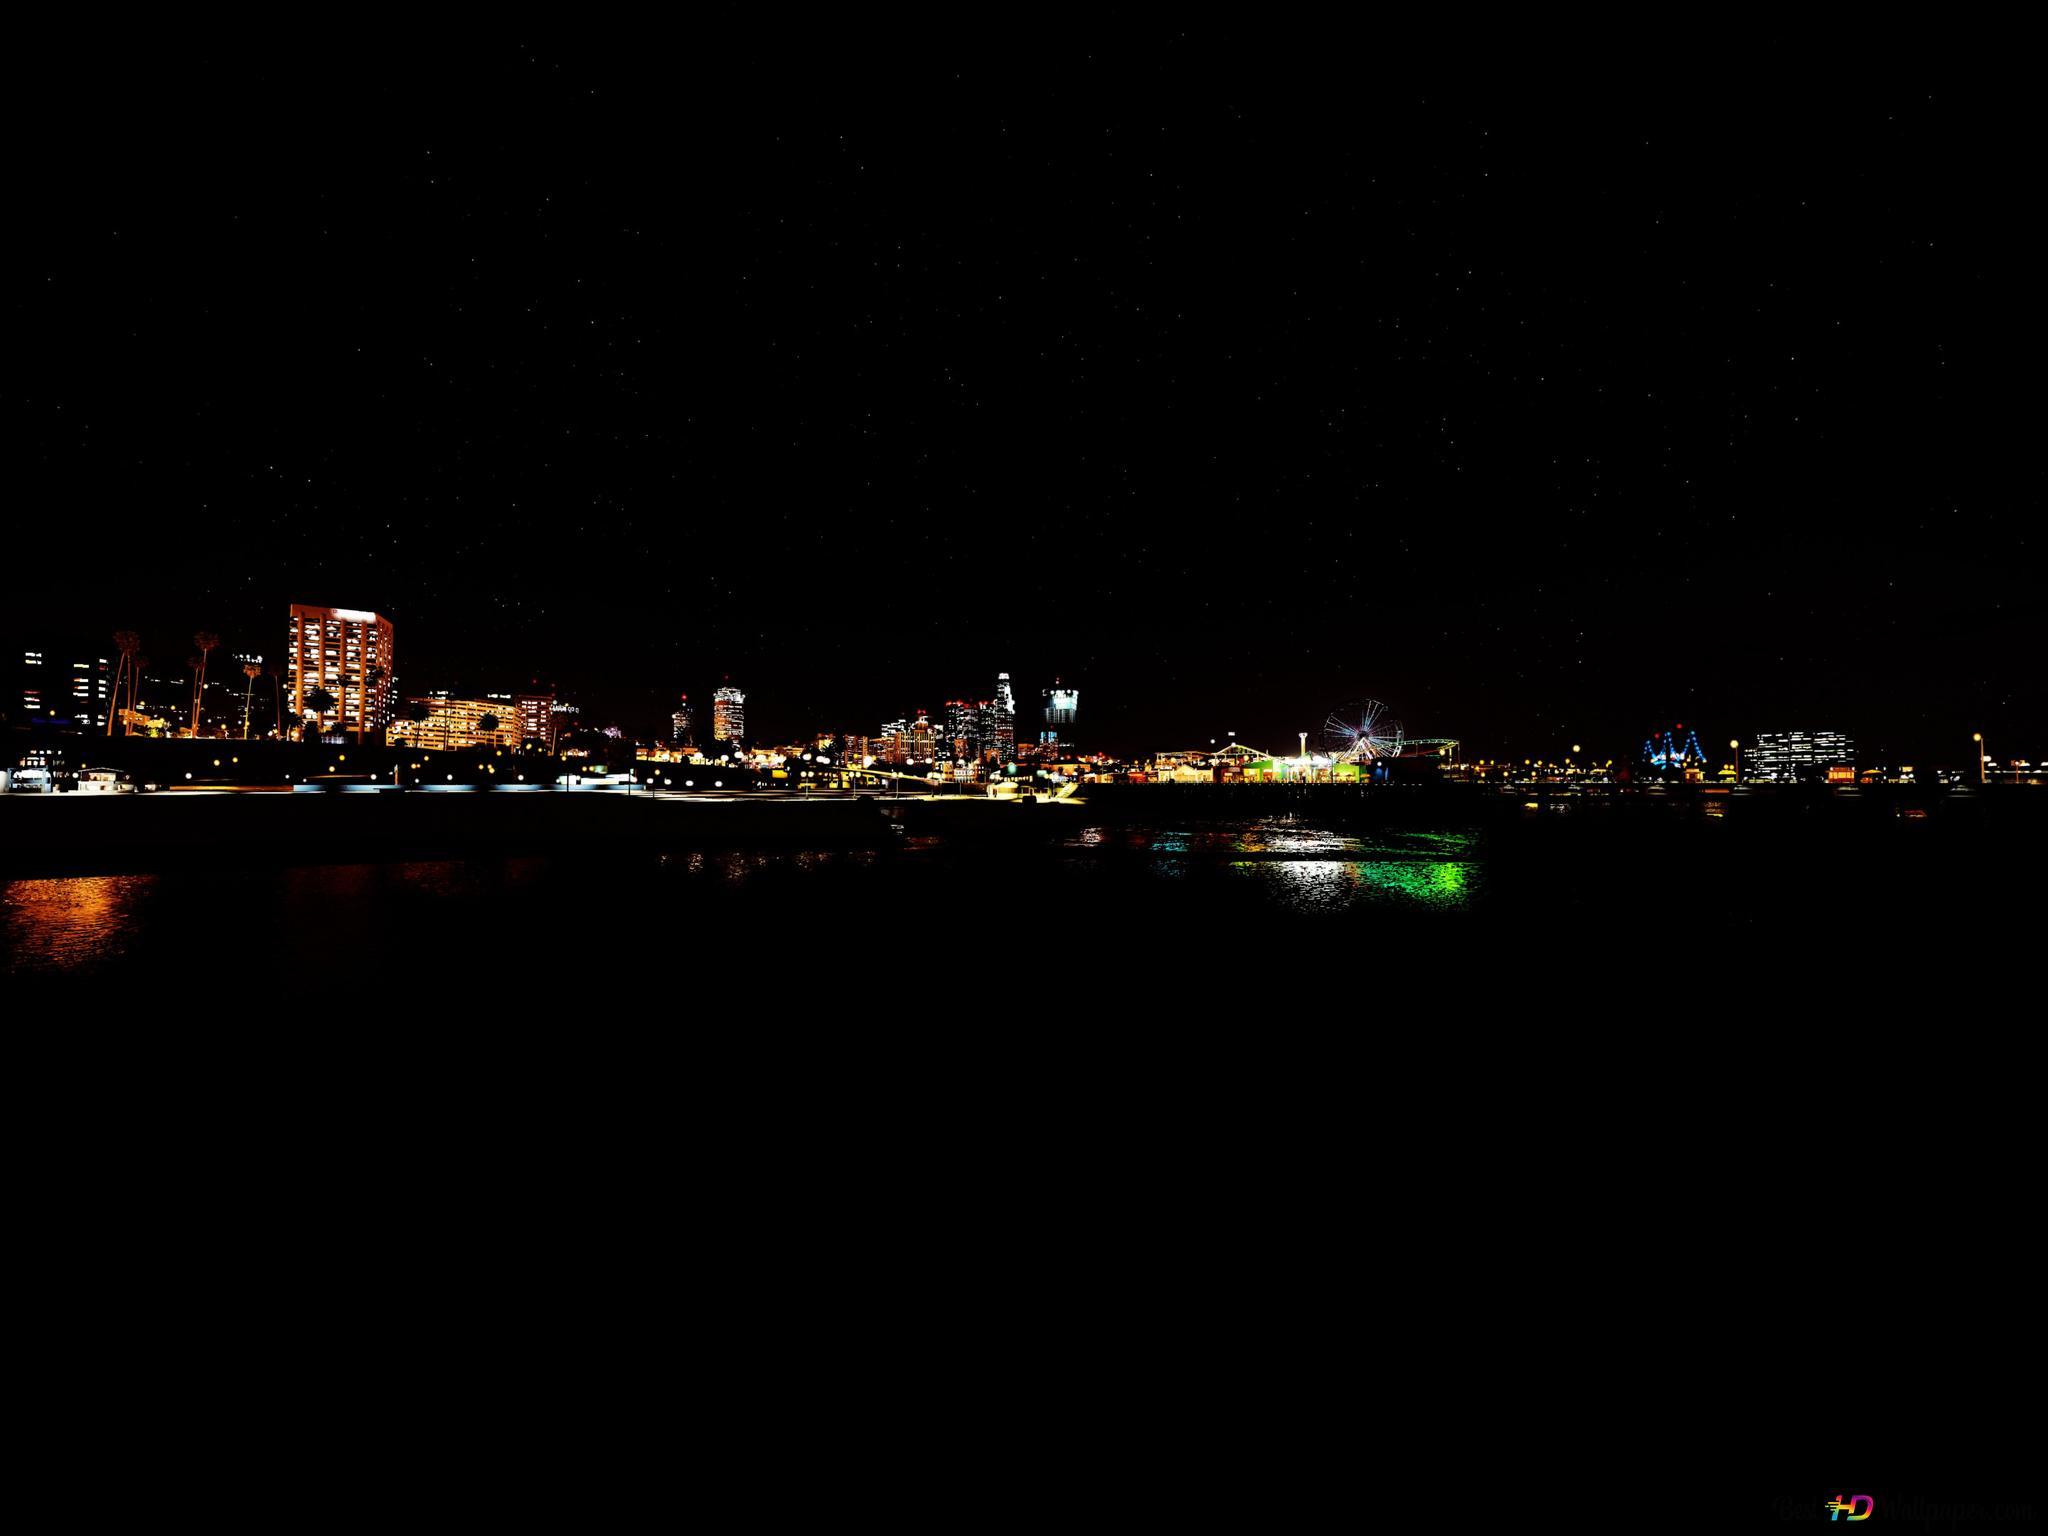 Los Santos La Nuit Hd Fond D Ecran Telecharger